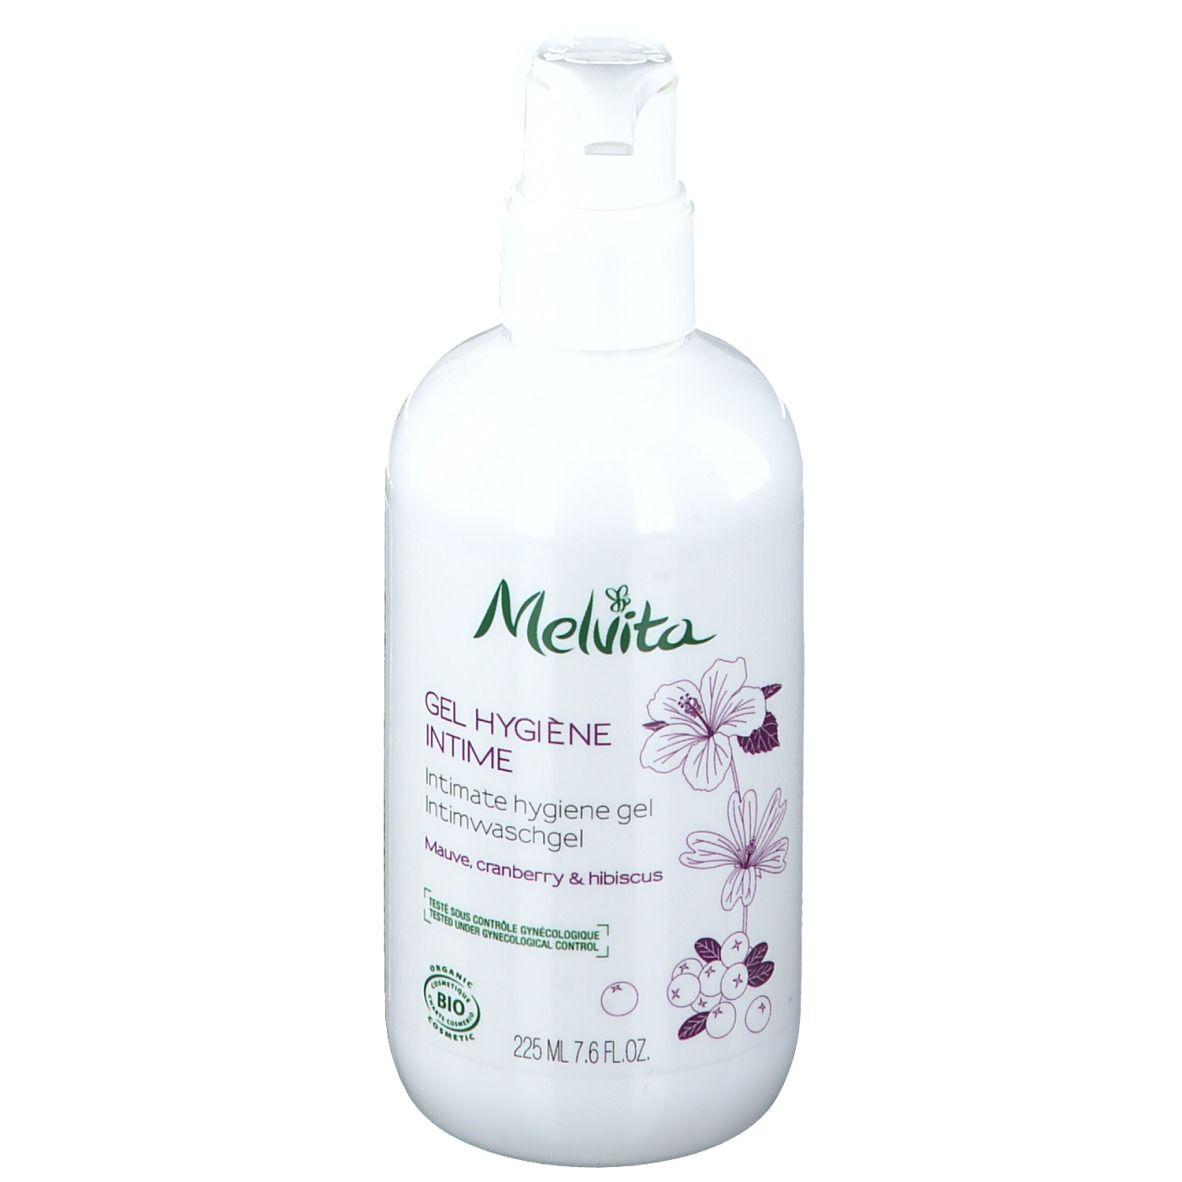 Melvita Gel hygiène intime ml gel(s)